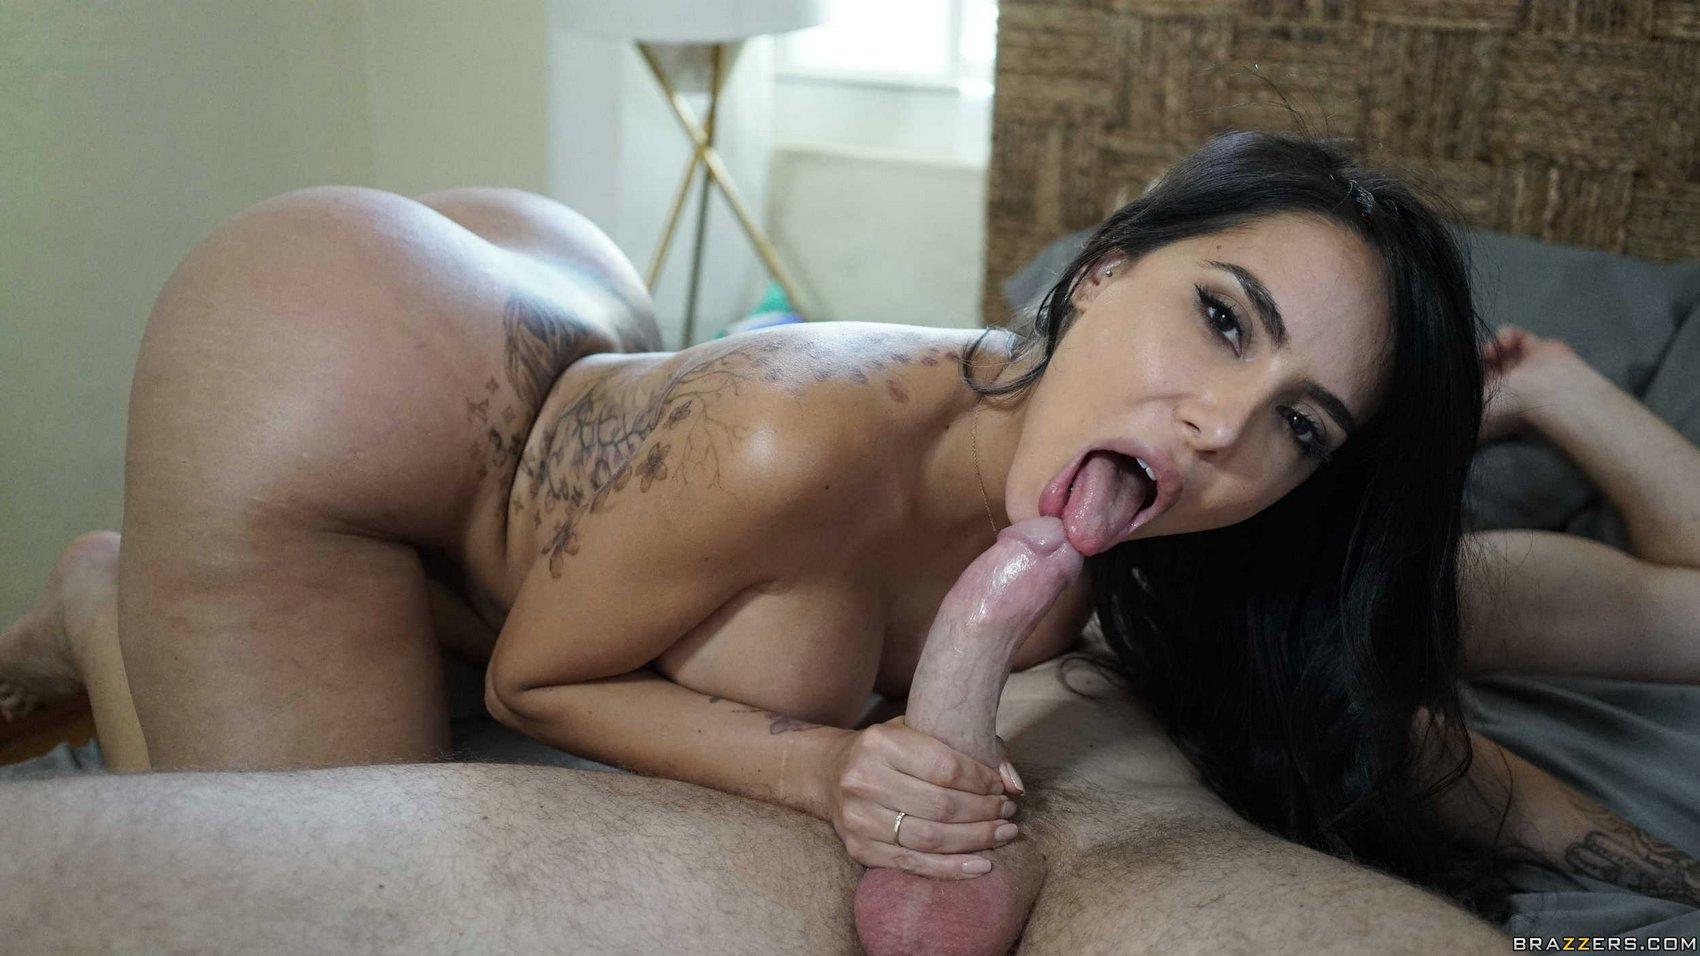 Lela star takes big dick